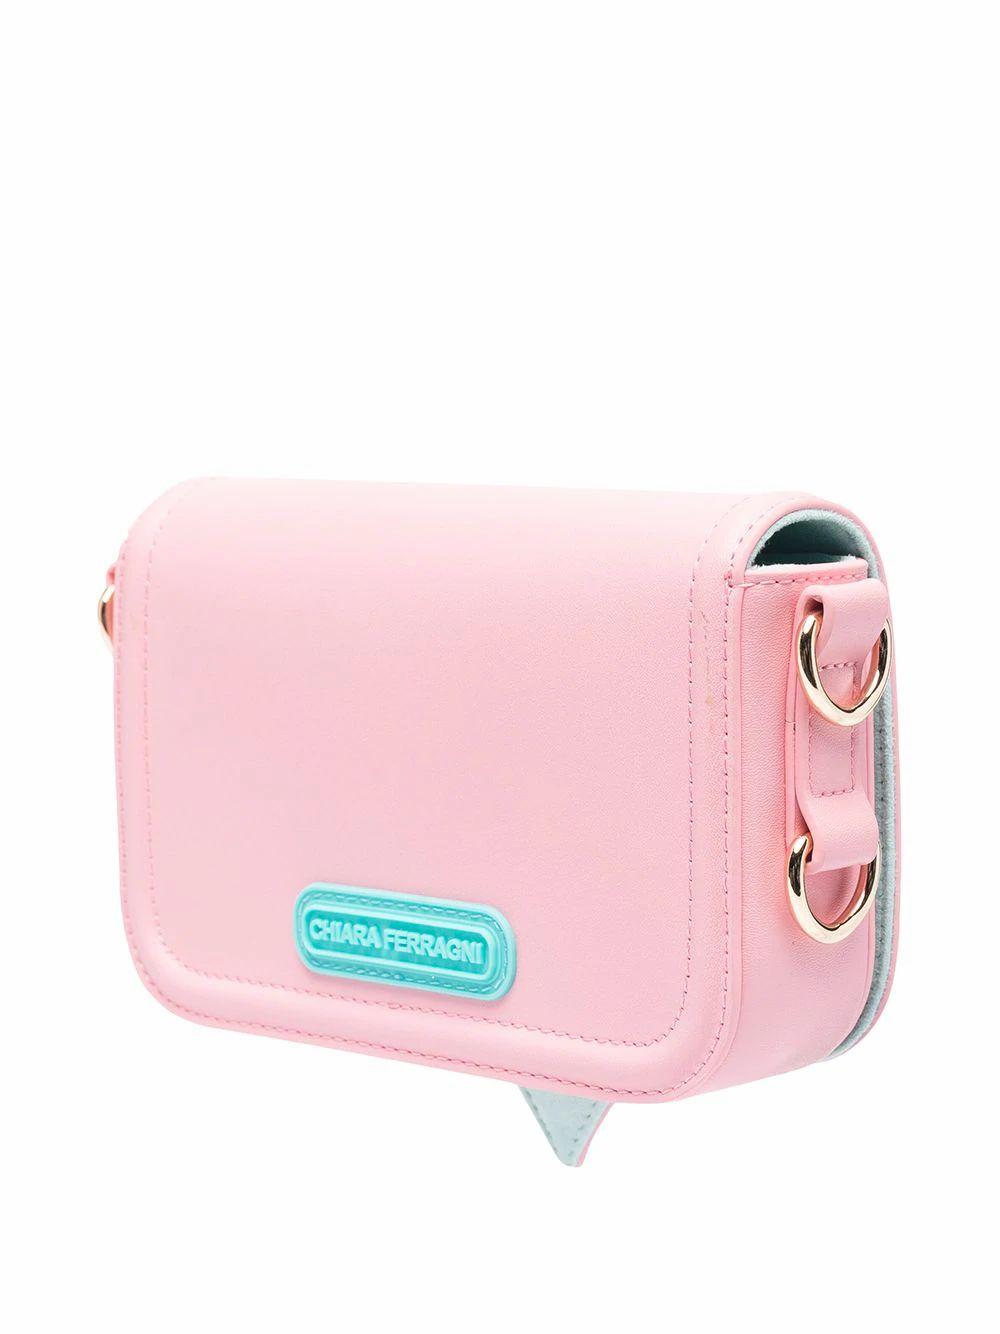 CHIARA FERRAGNI Shoulder bags CHIARA FERRAGNI WOMEN'S PINK POLYURETHANE SHOULDER BAG